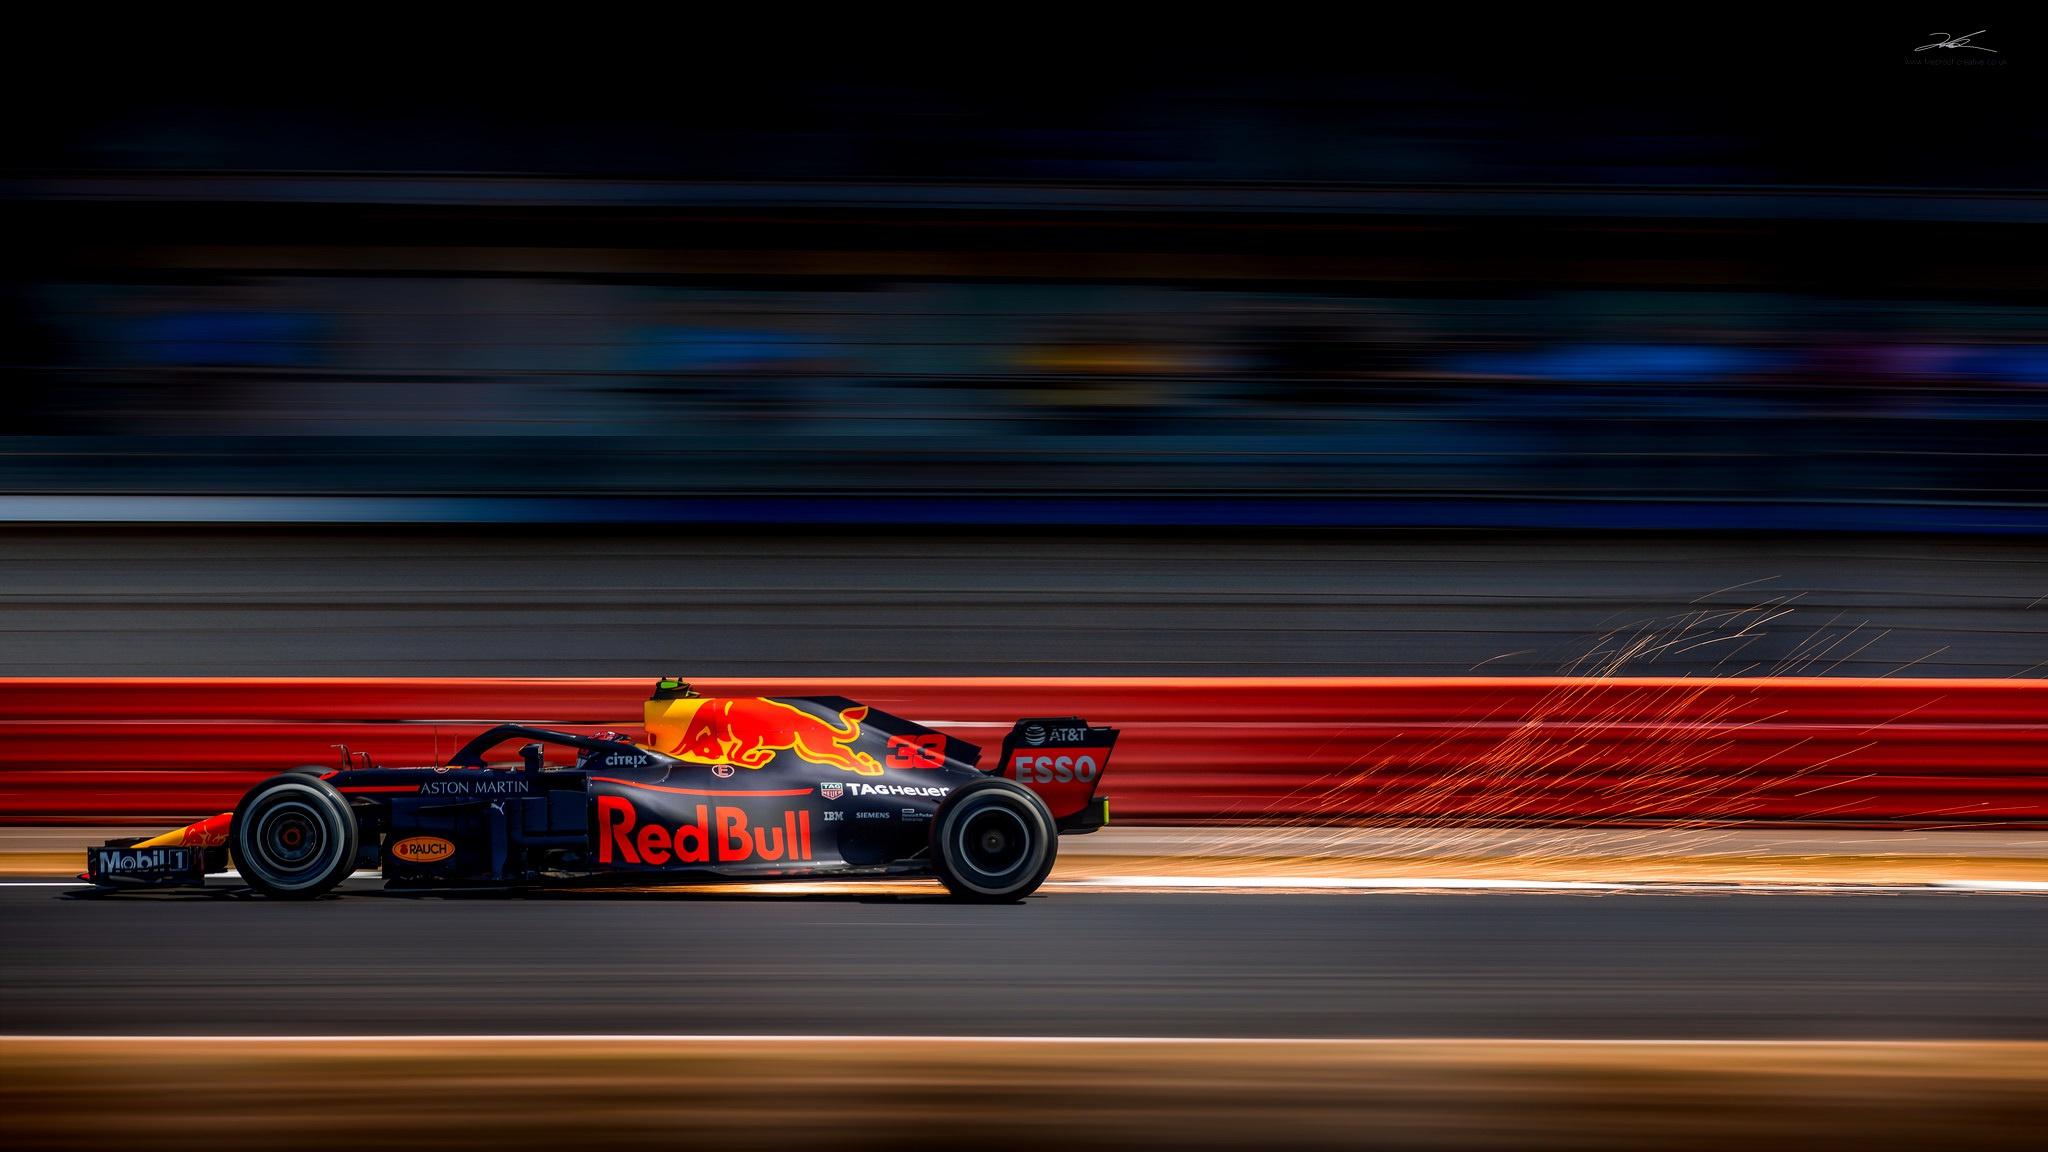 F1 HD Wallpaper | Background Image | 2048x1152 | ID:939125 ...